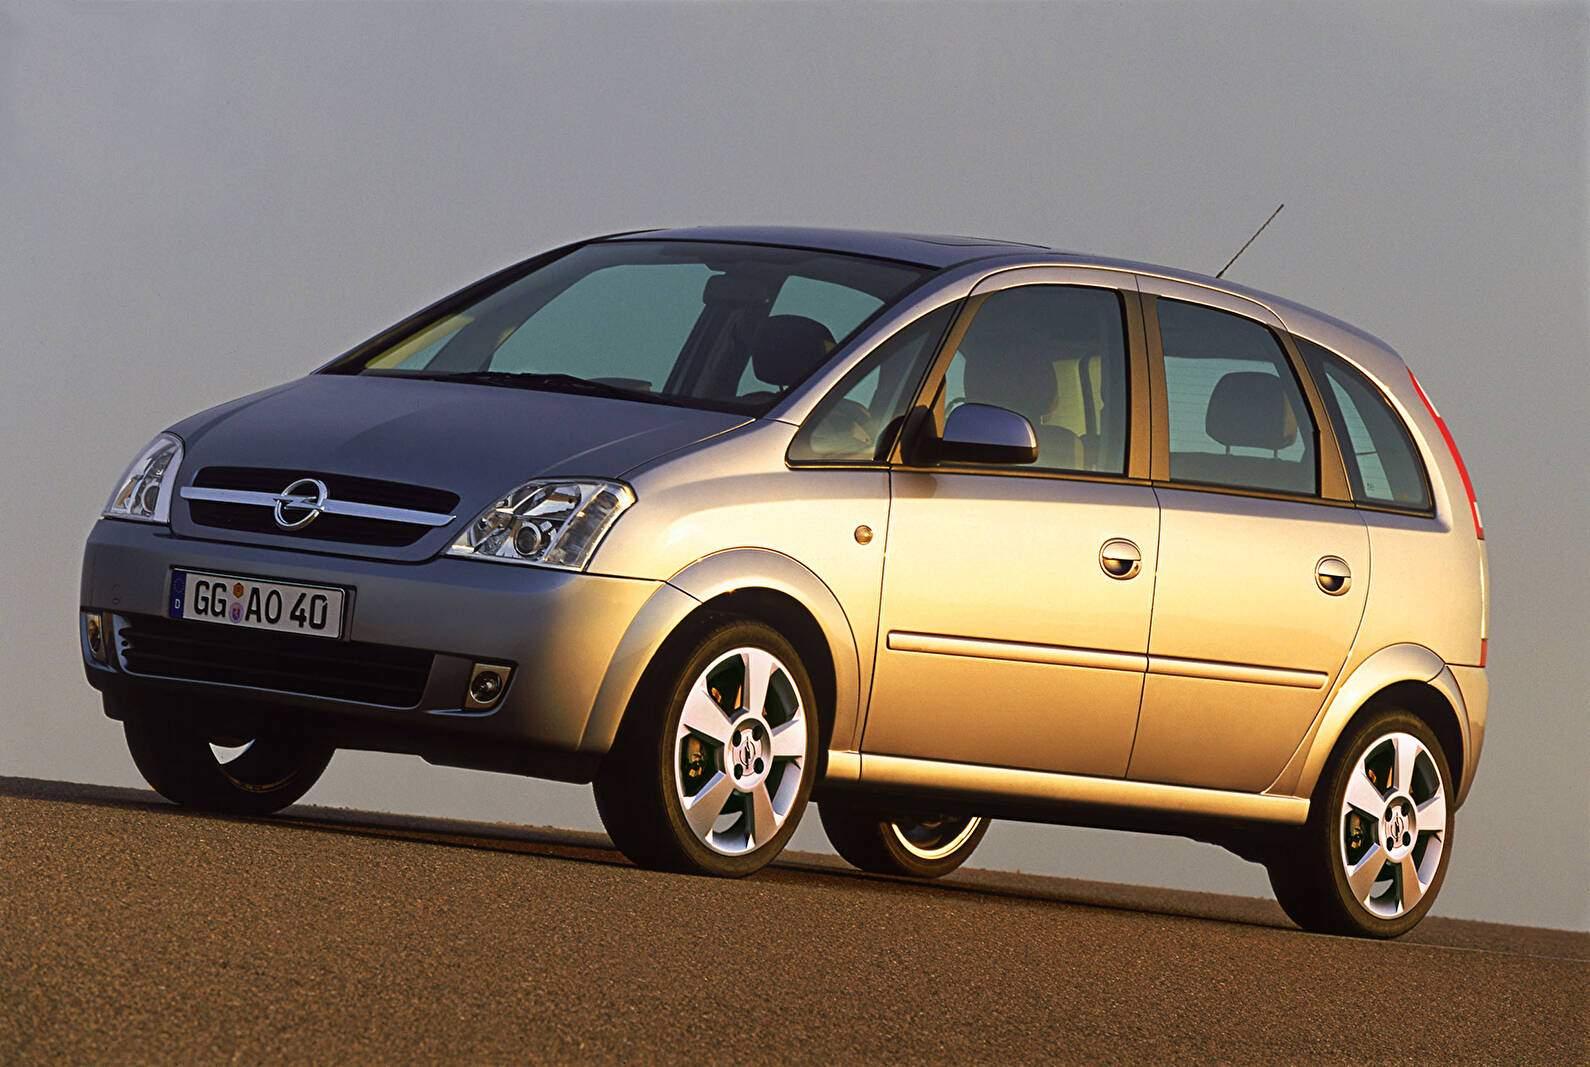 Opel Meriva 1.8 (2003-2009),  ajouté par fox58